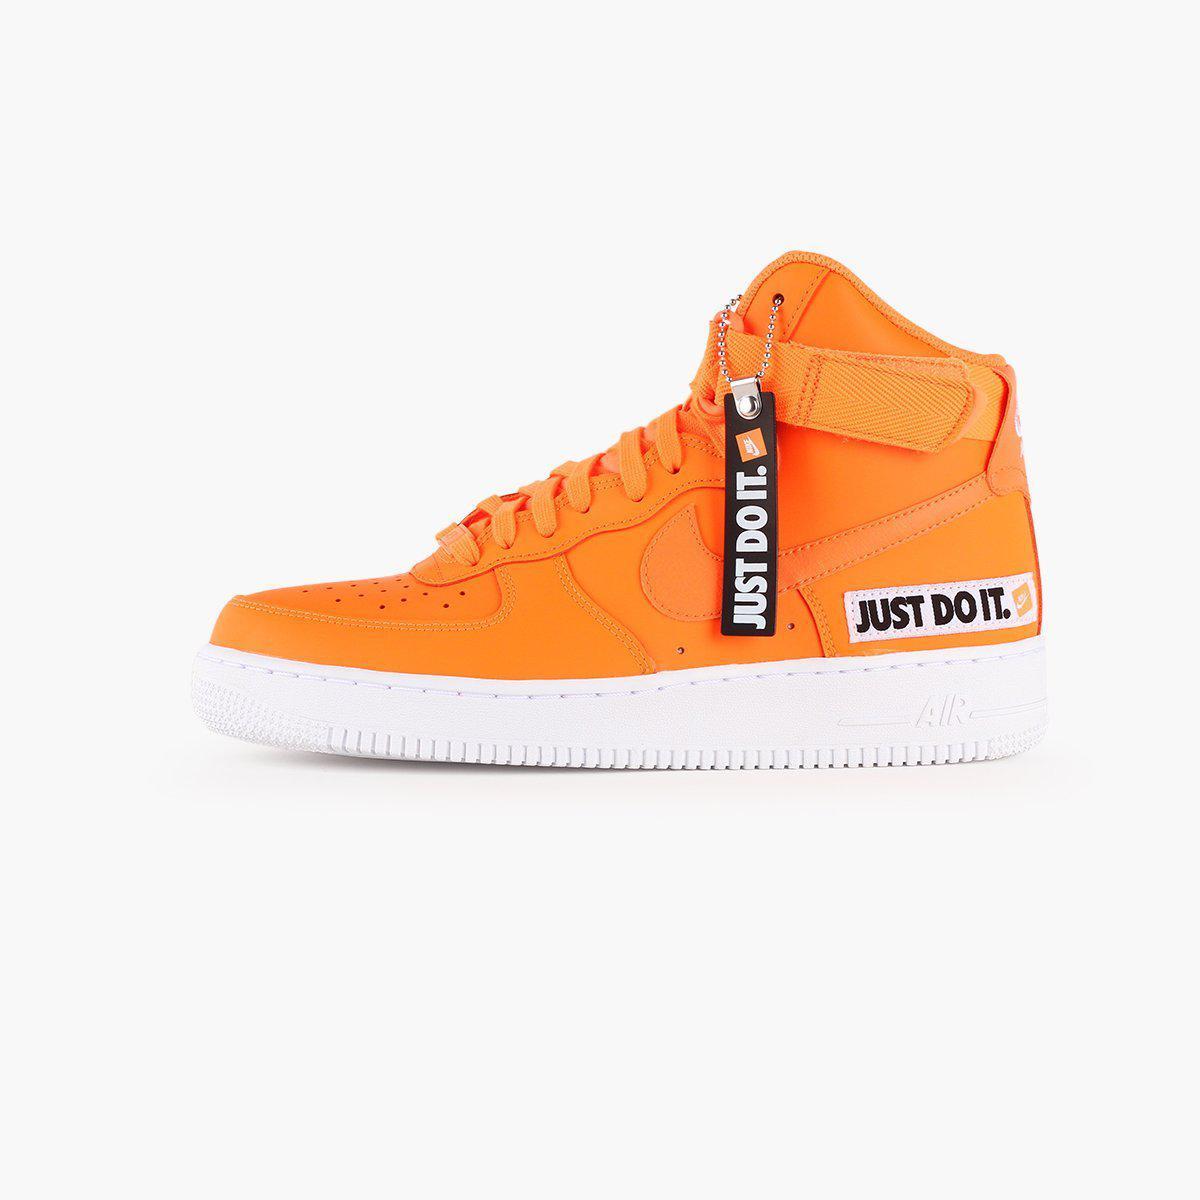 9a6cf79764fe5b Nike Air Force 1 High Lx Leather Women s in Orange - Lyst